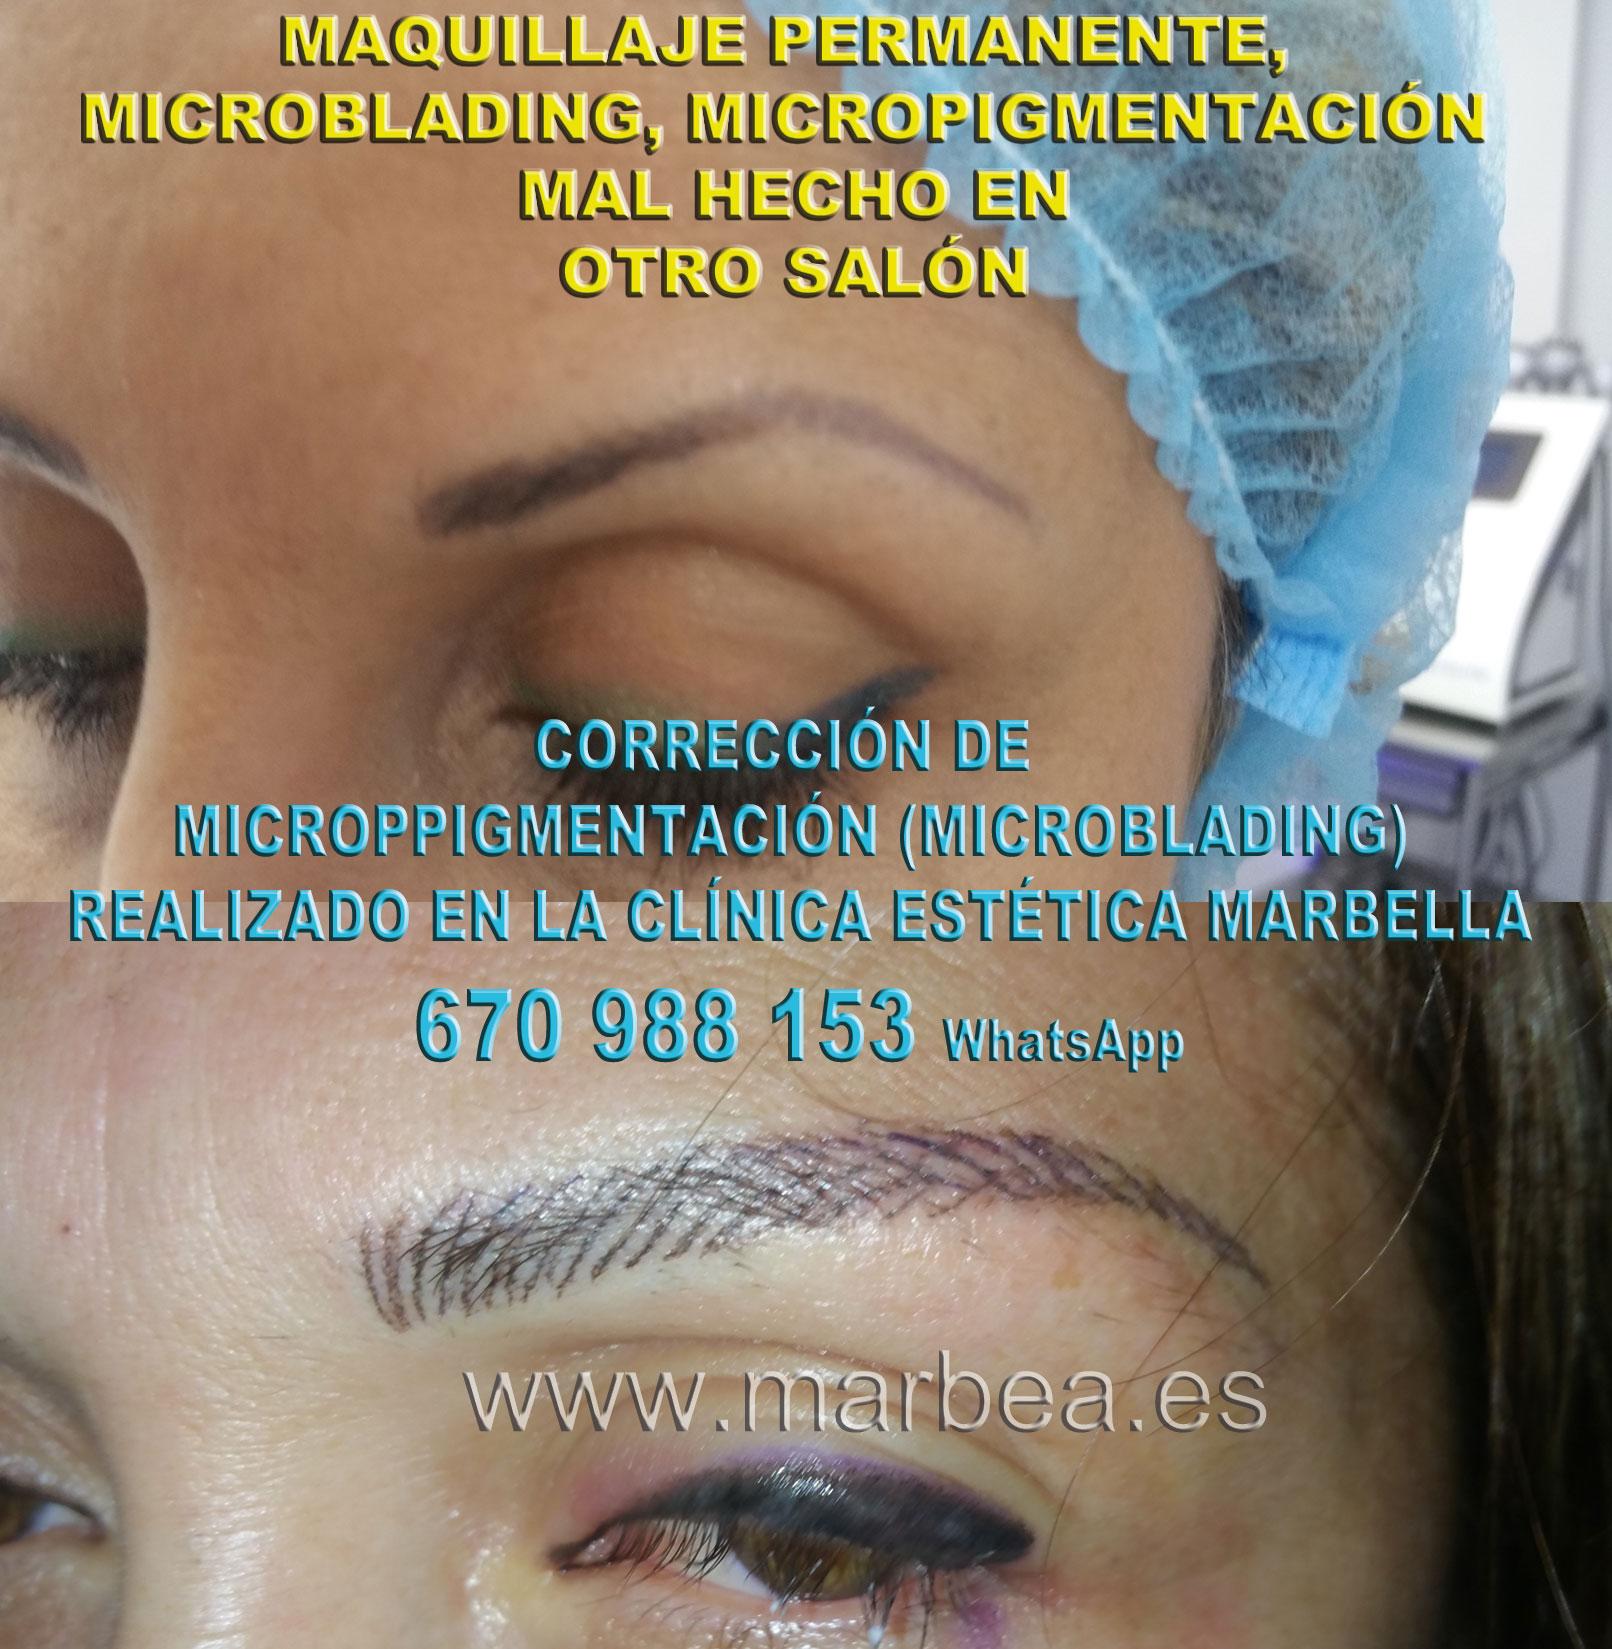 ELIMINAR MICROBLADING CEJAS clínica estética maquillaje semipermanente entrega corrección de micropigmentación en cejas,corregir micropigmentación mal hecha